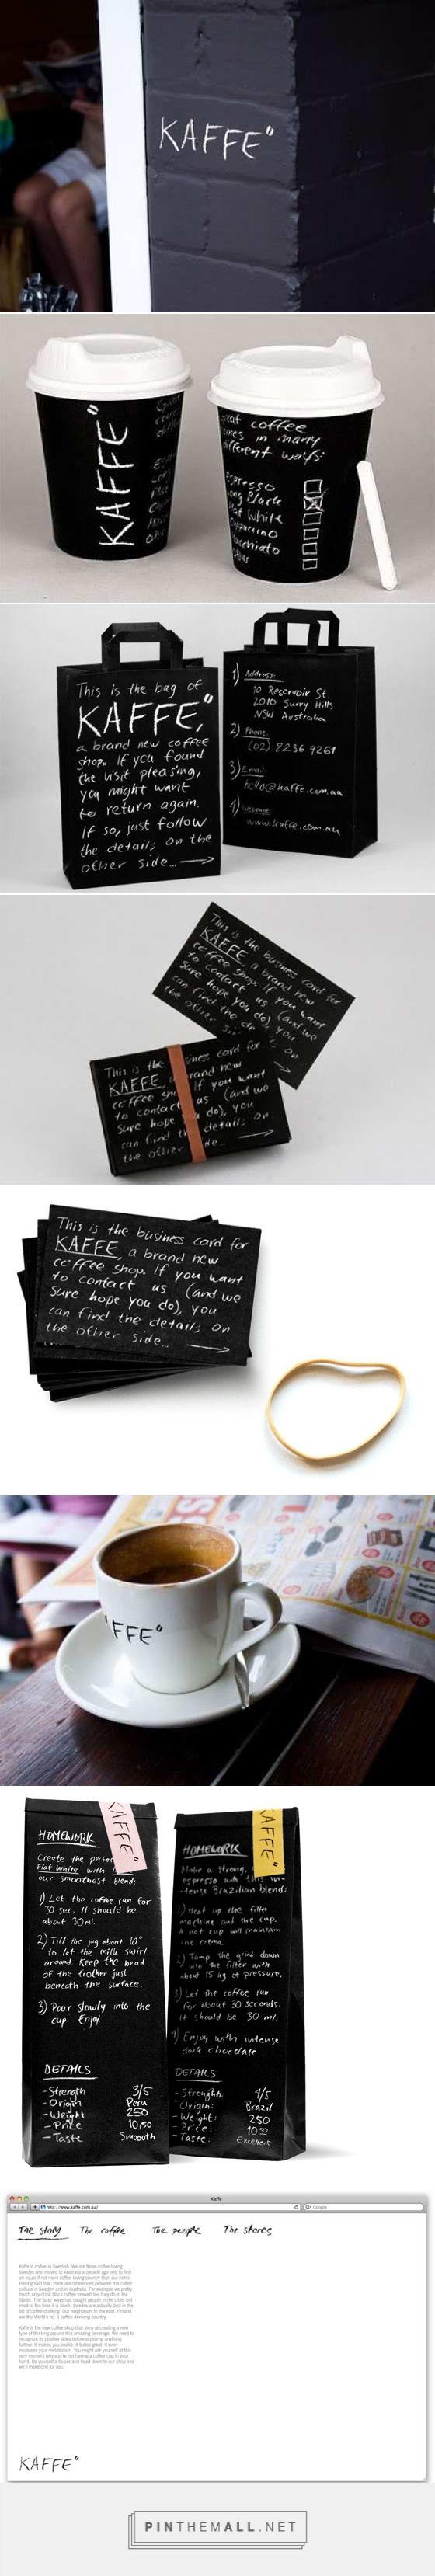 "Kaffe"" Coffee Shop Branding & Packaging By Jared Erickson"